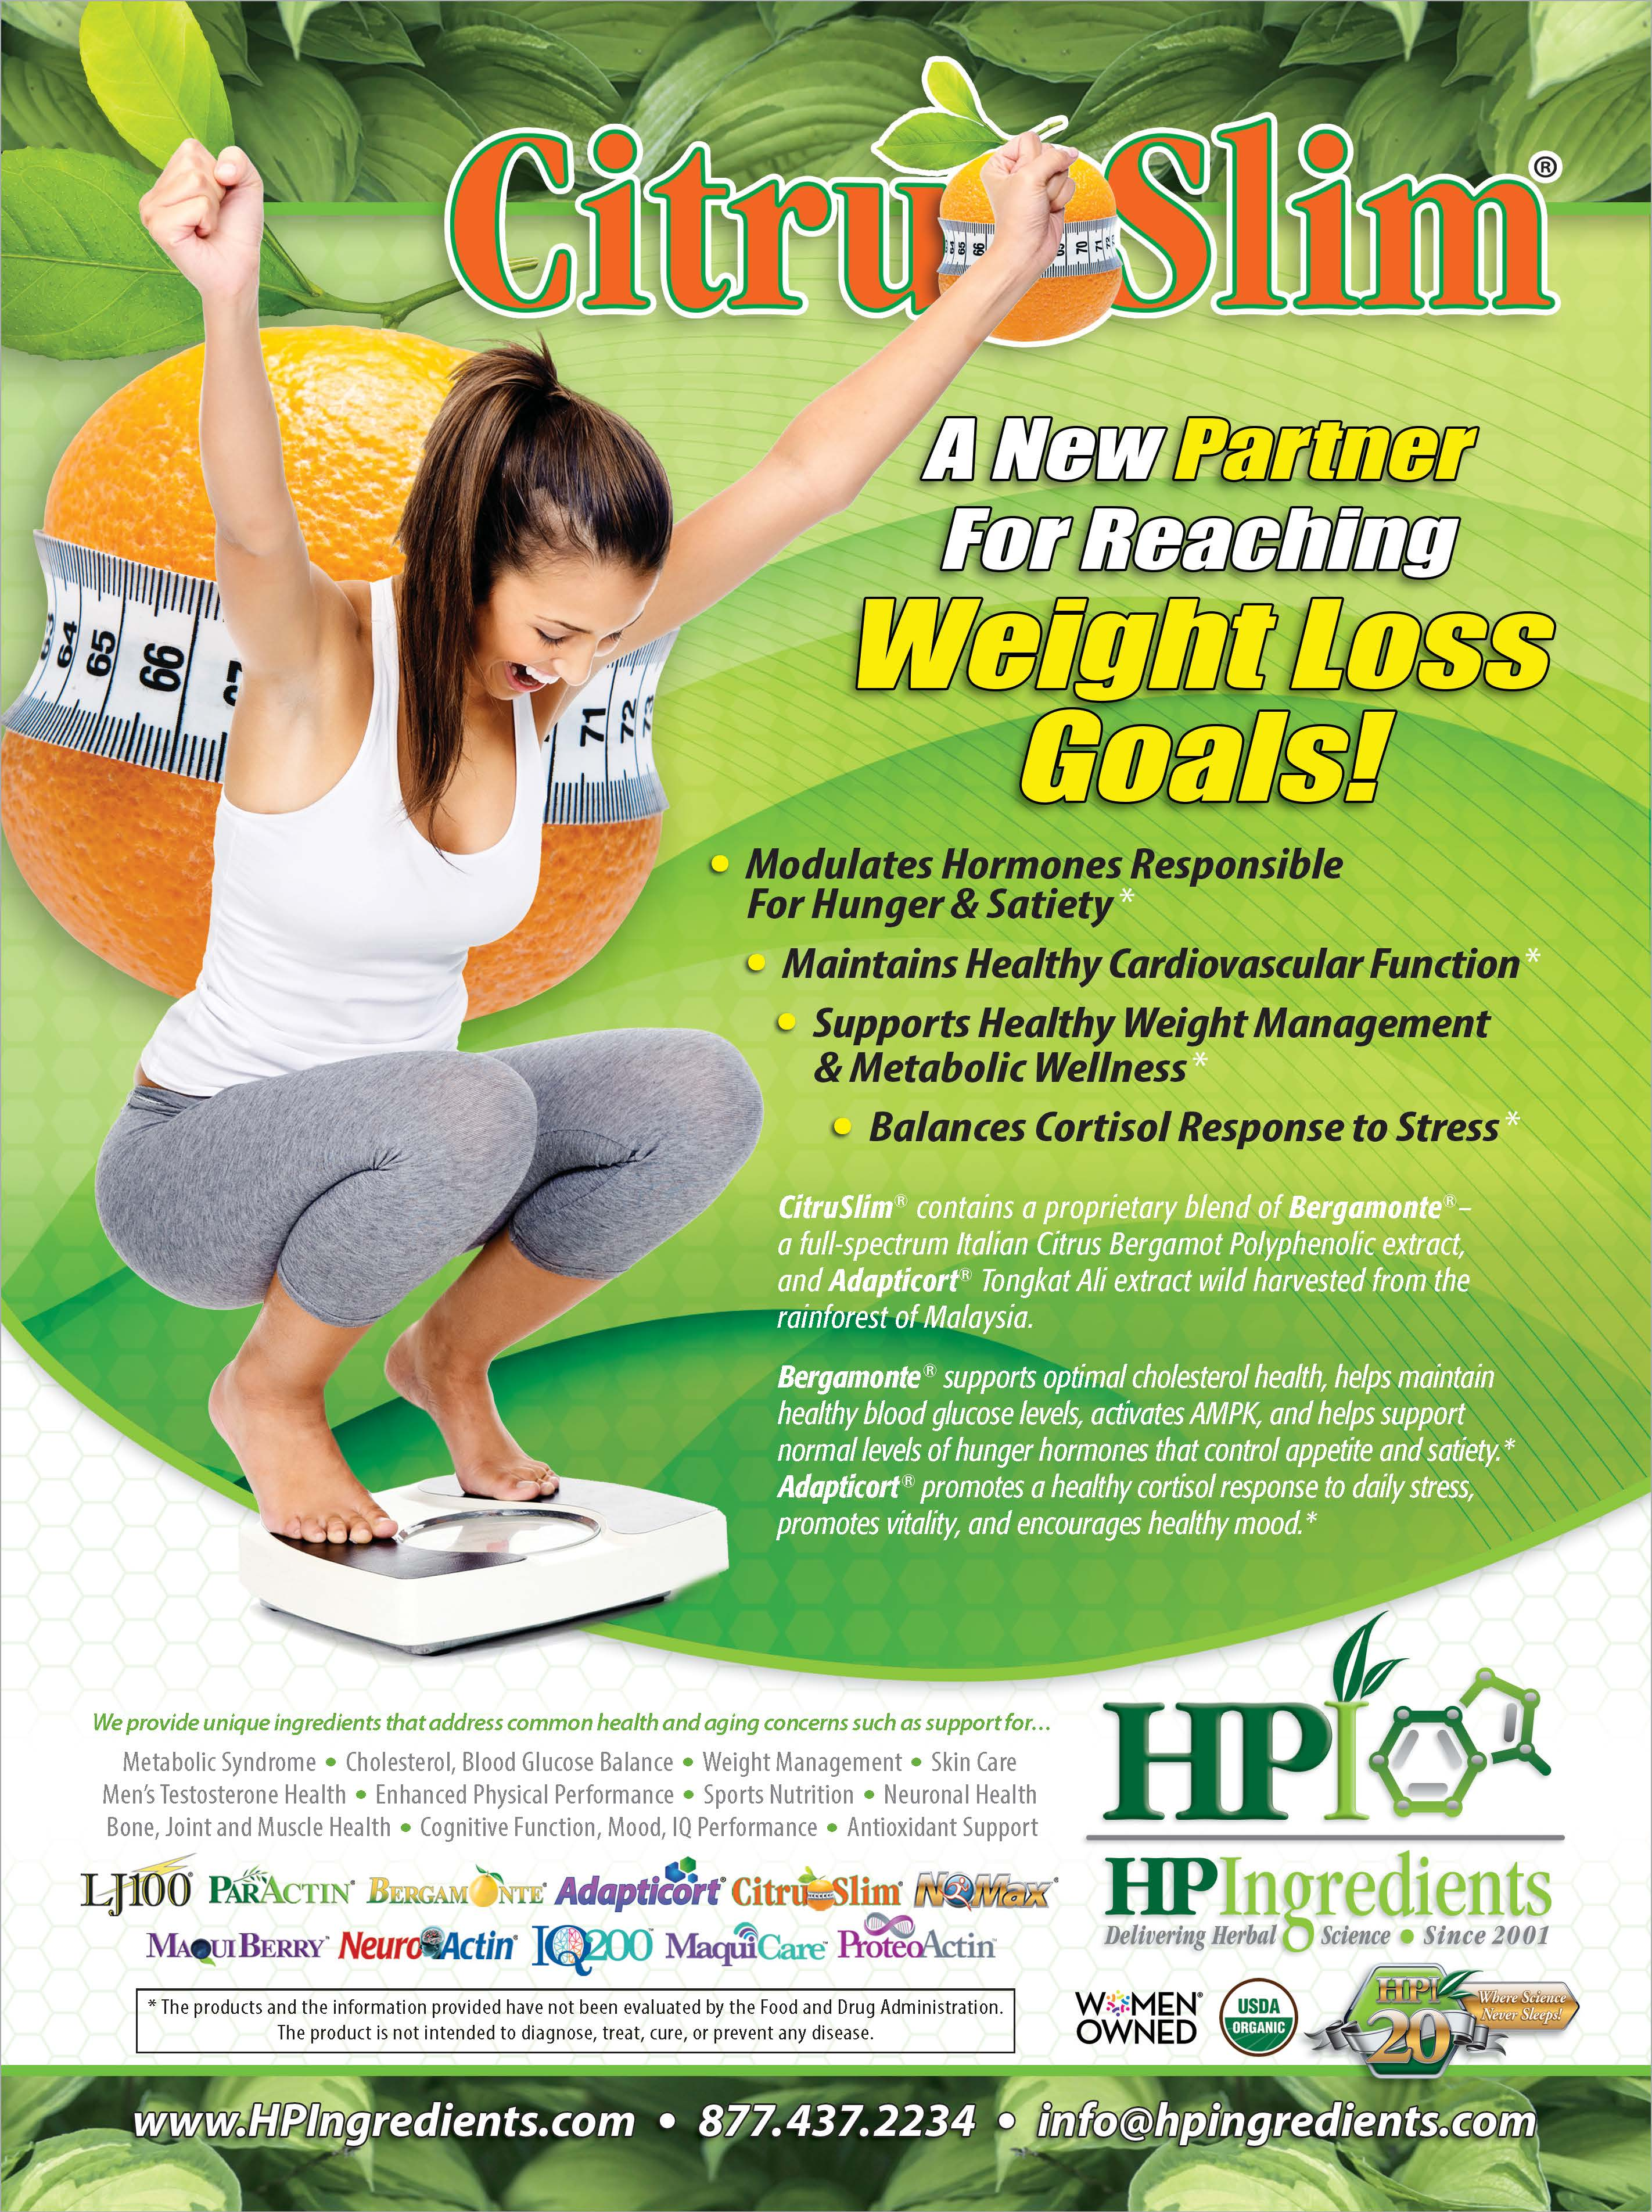 hpi_natprodinsider_fpg_weight